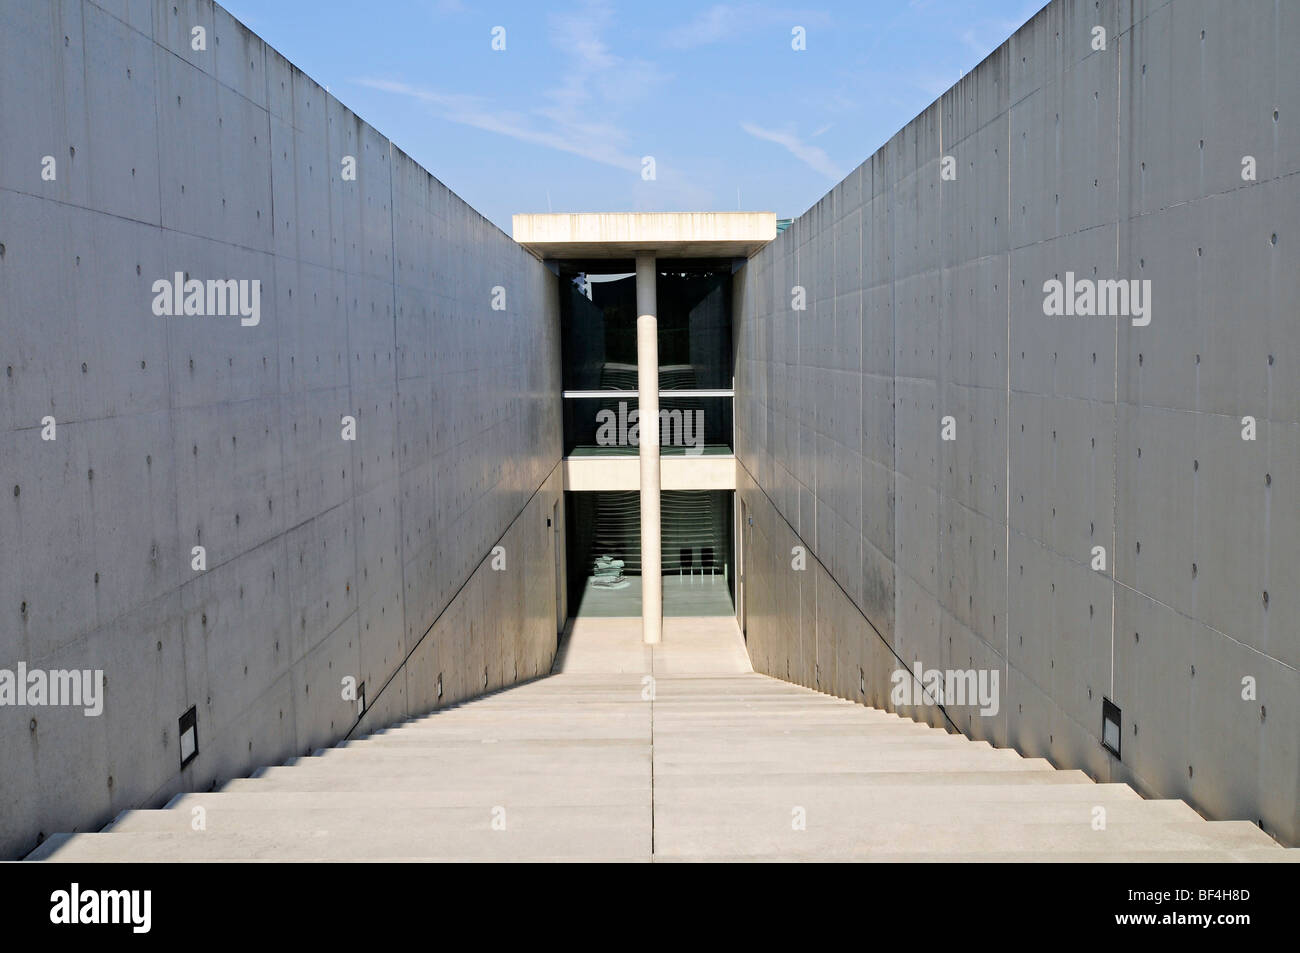 Moderne Architektur Treppen Beton Ehemalige Raketenbasis Kunstmuseum Langen Foundation Architekt Tadao Ando Hombroich Kre